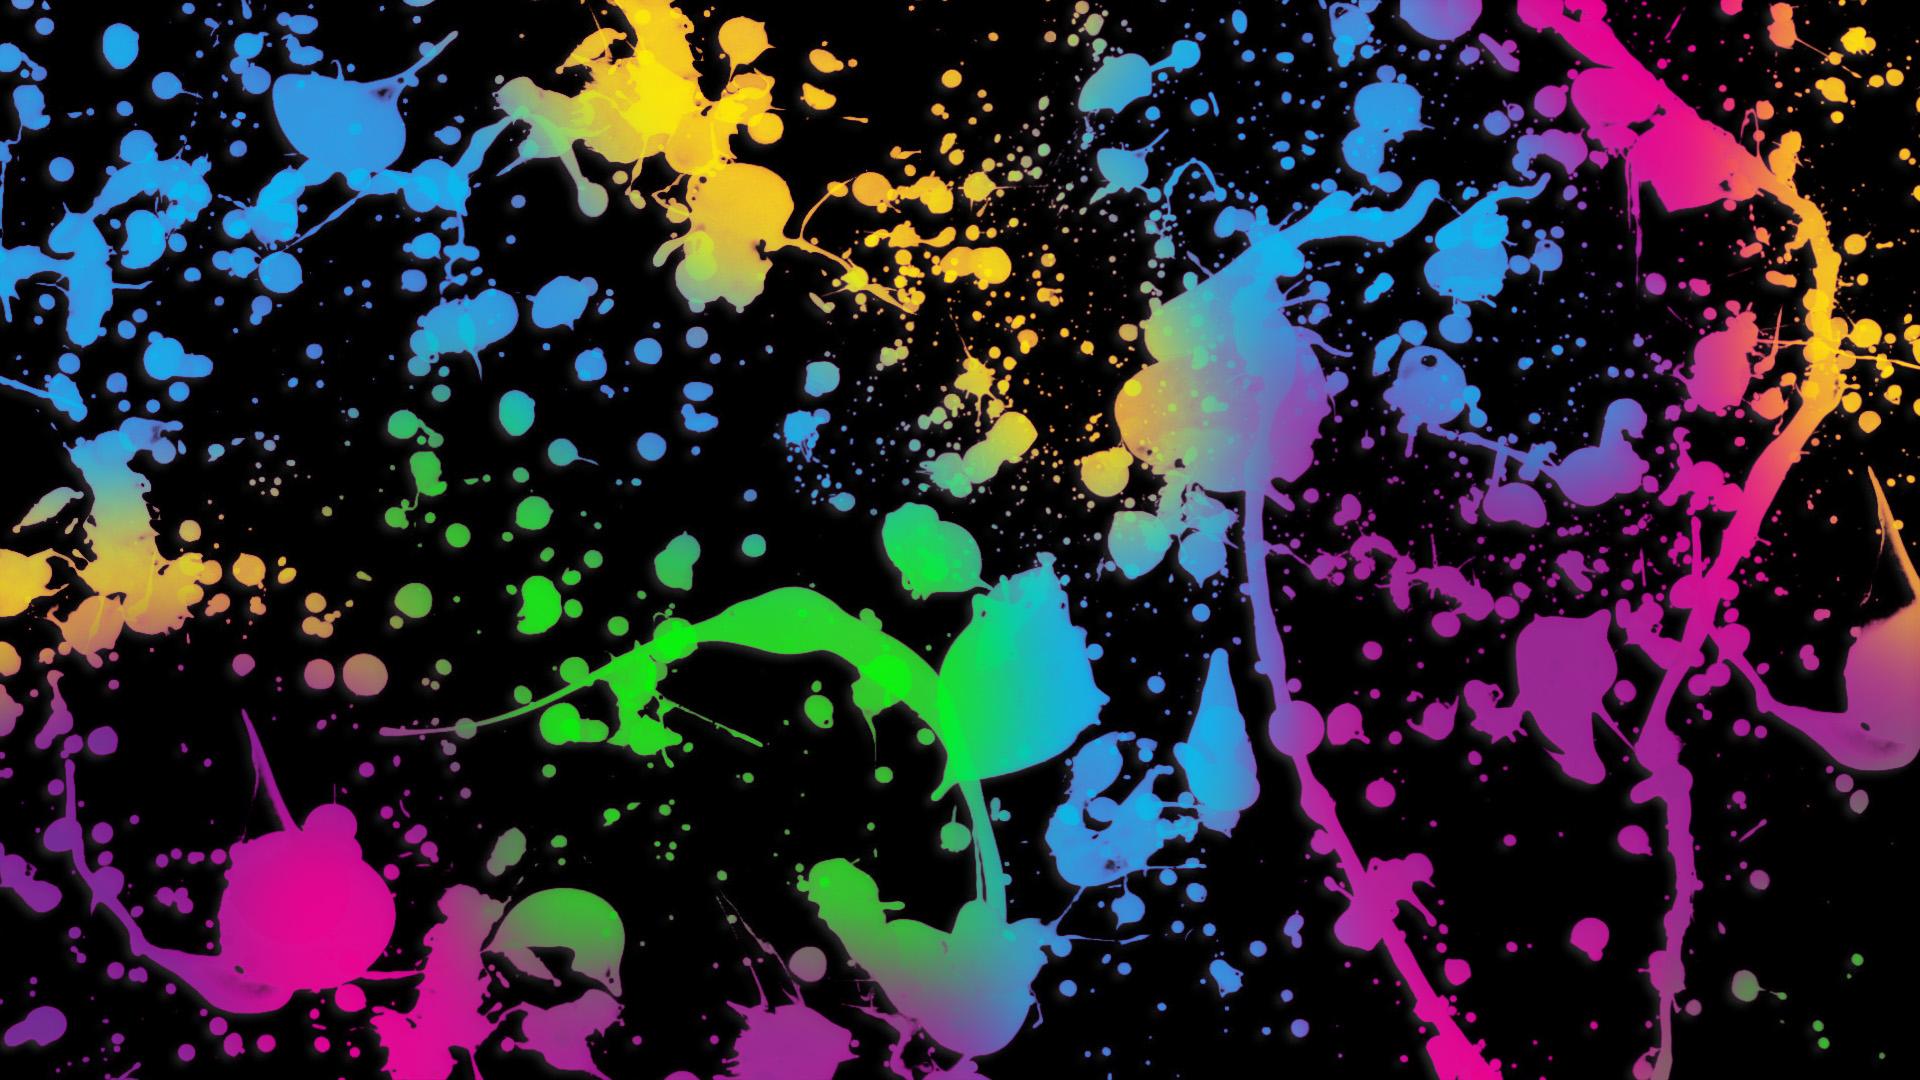 74 Paint Splat Wallpaper On Wallpapersafari